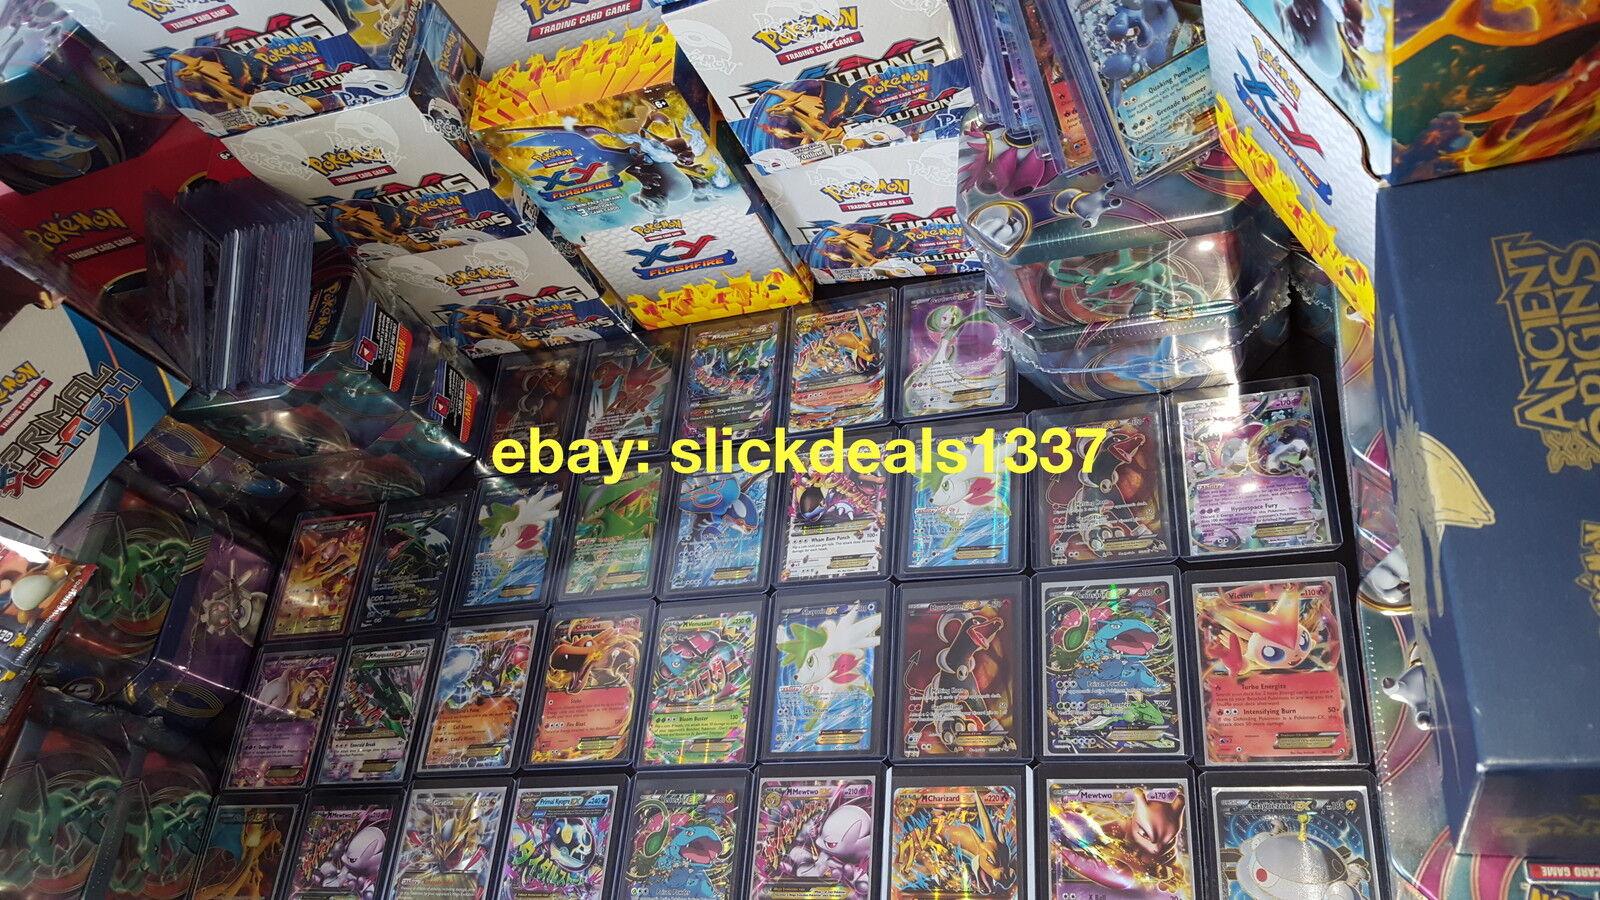 SlickDeals1337